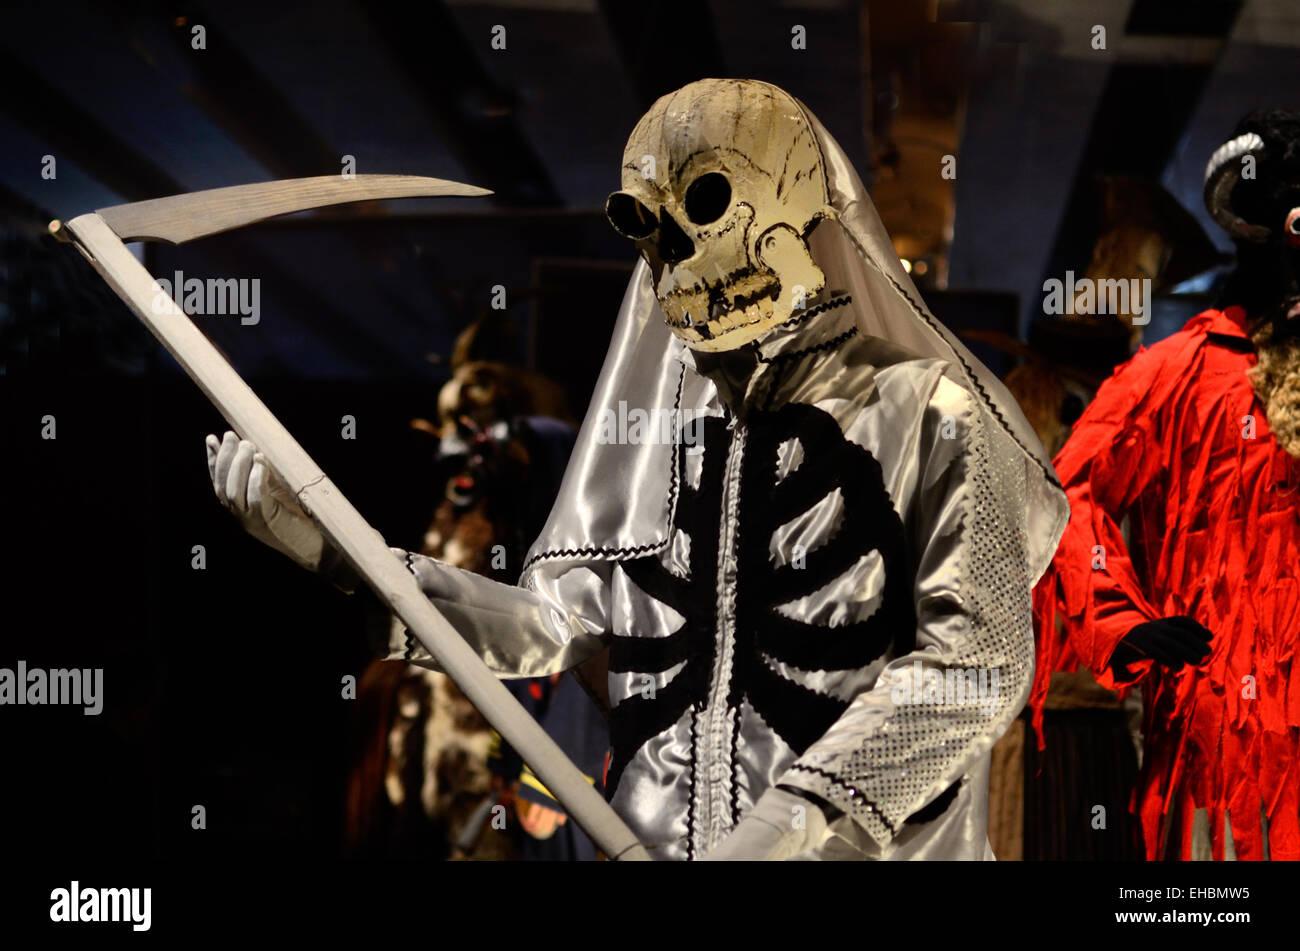 Death Costume Grim Reaper Devil or Satan with Scythe from Zielonki Carnival Poland - Stock Image